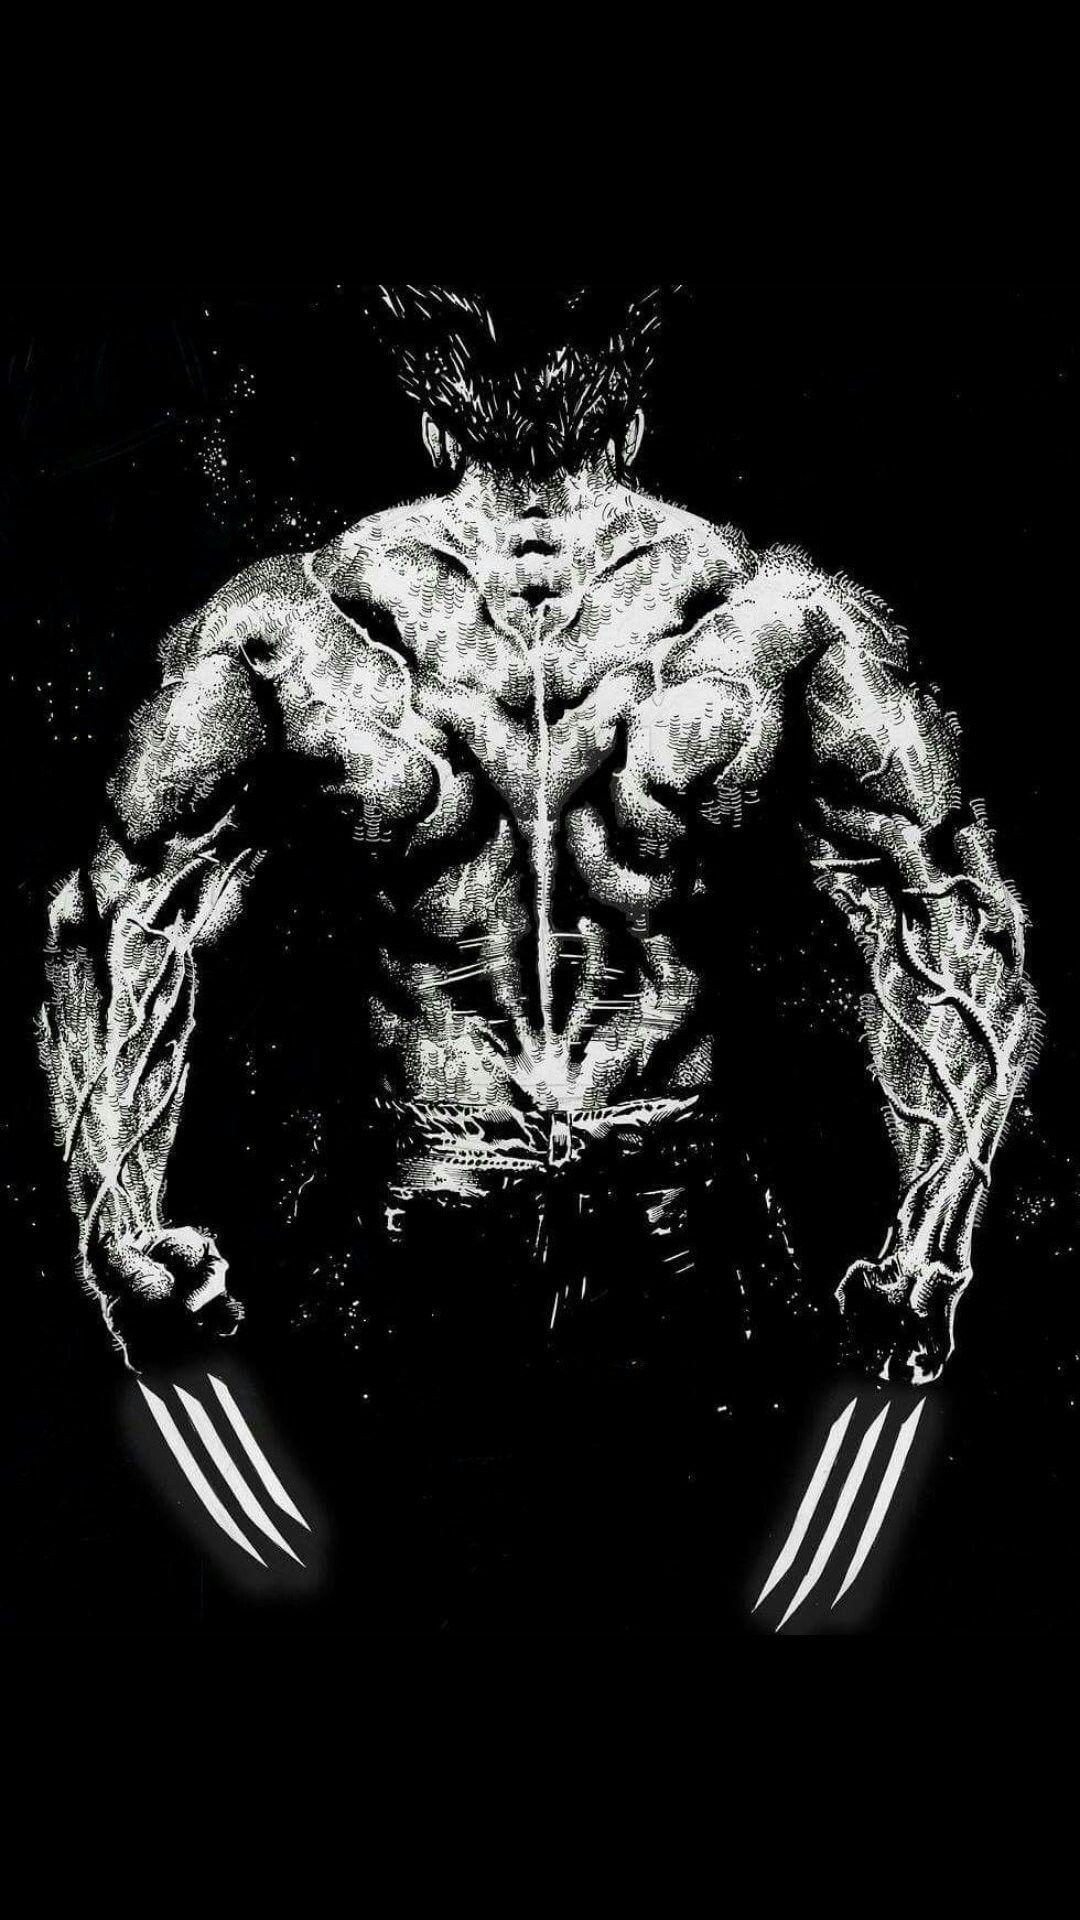 Pin By Balaje Vivek On Marvel Wolverine Wallpaper Superhero Wallpaper Wolverine